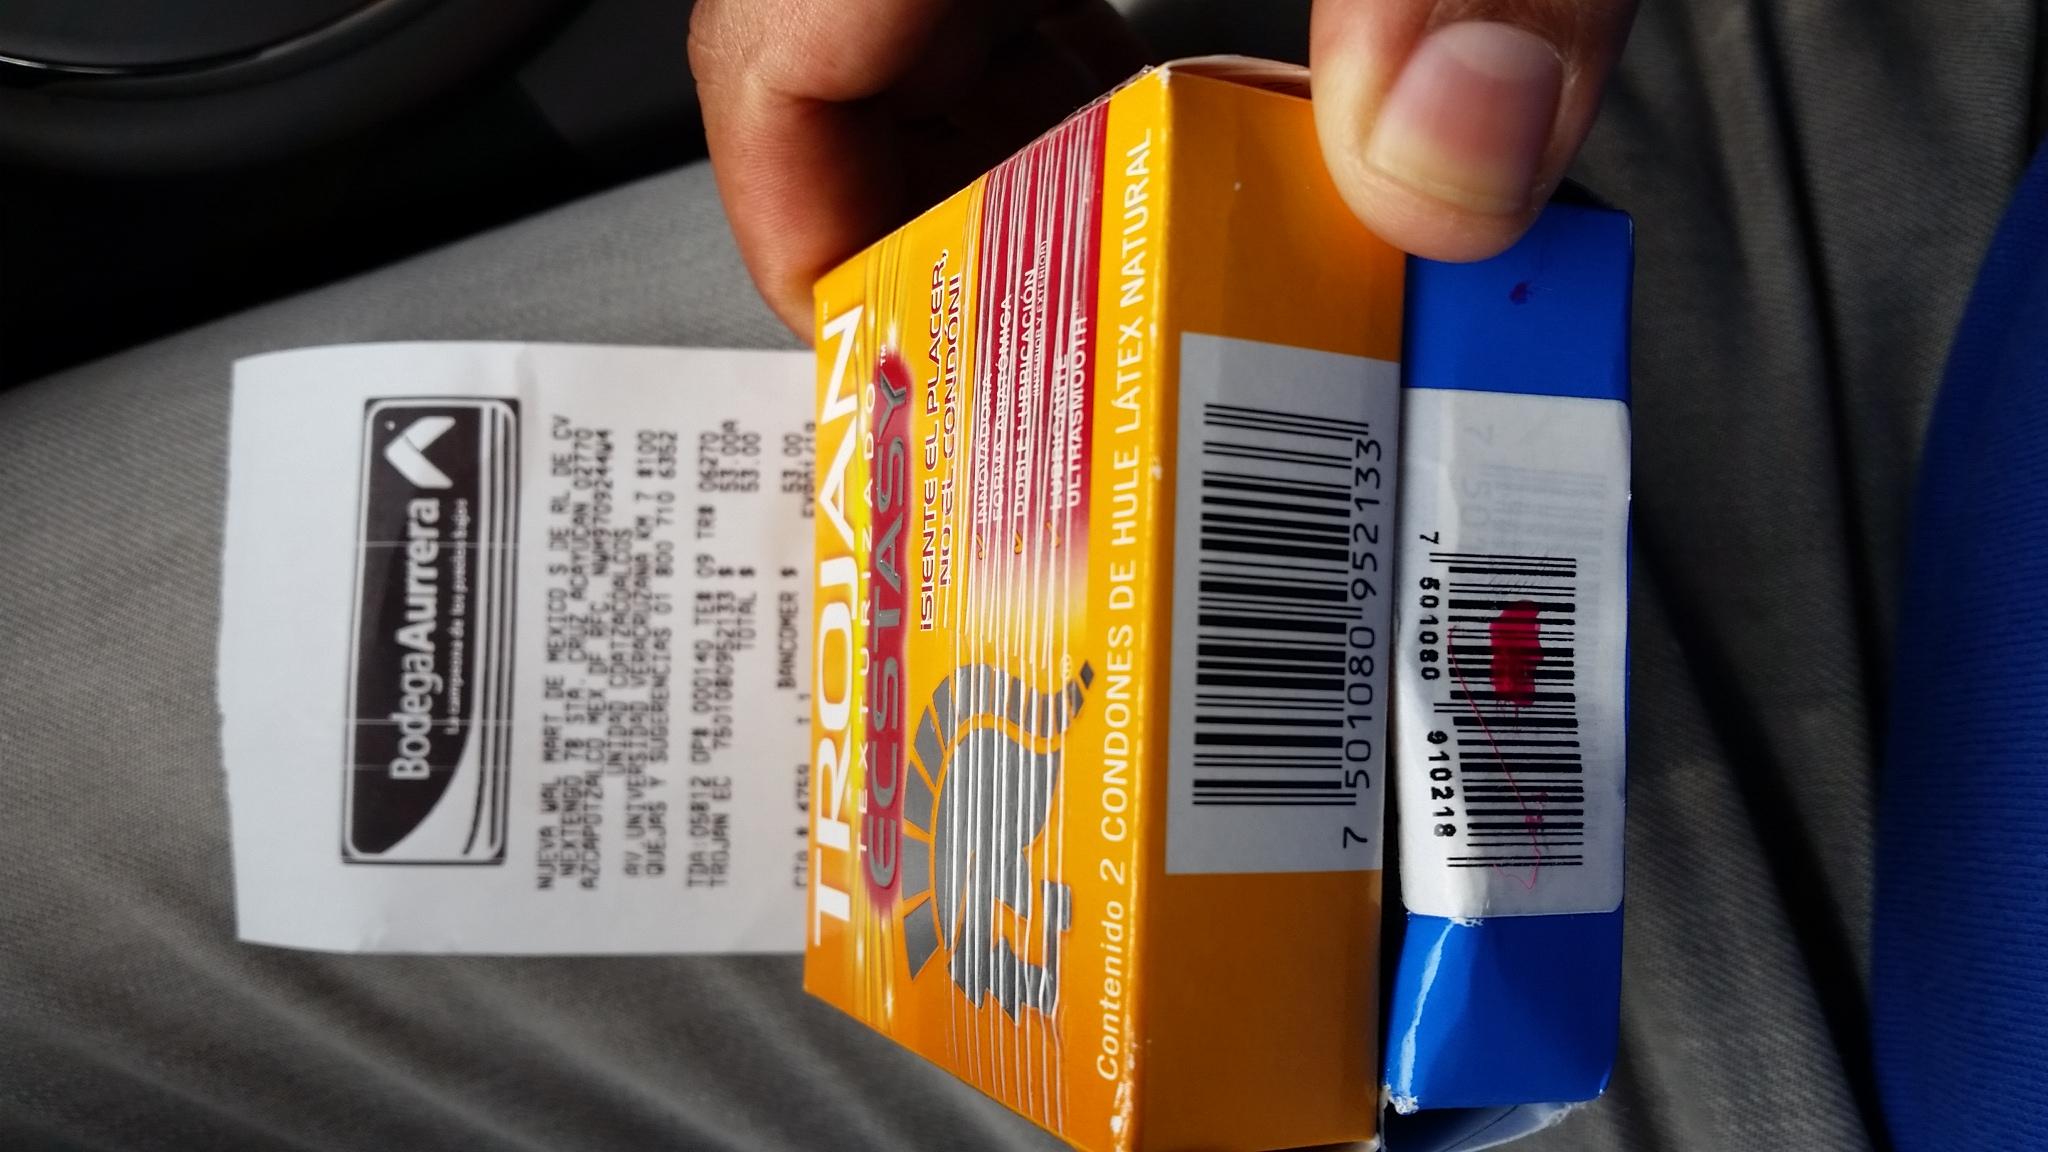 Bodega Aurrerá Coatzacalcos: 5 condones Trojan por $53 -oferta armada-